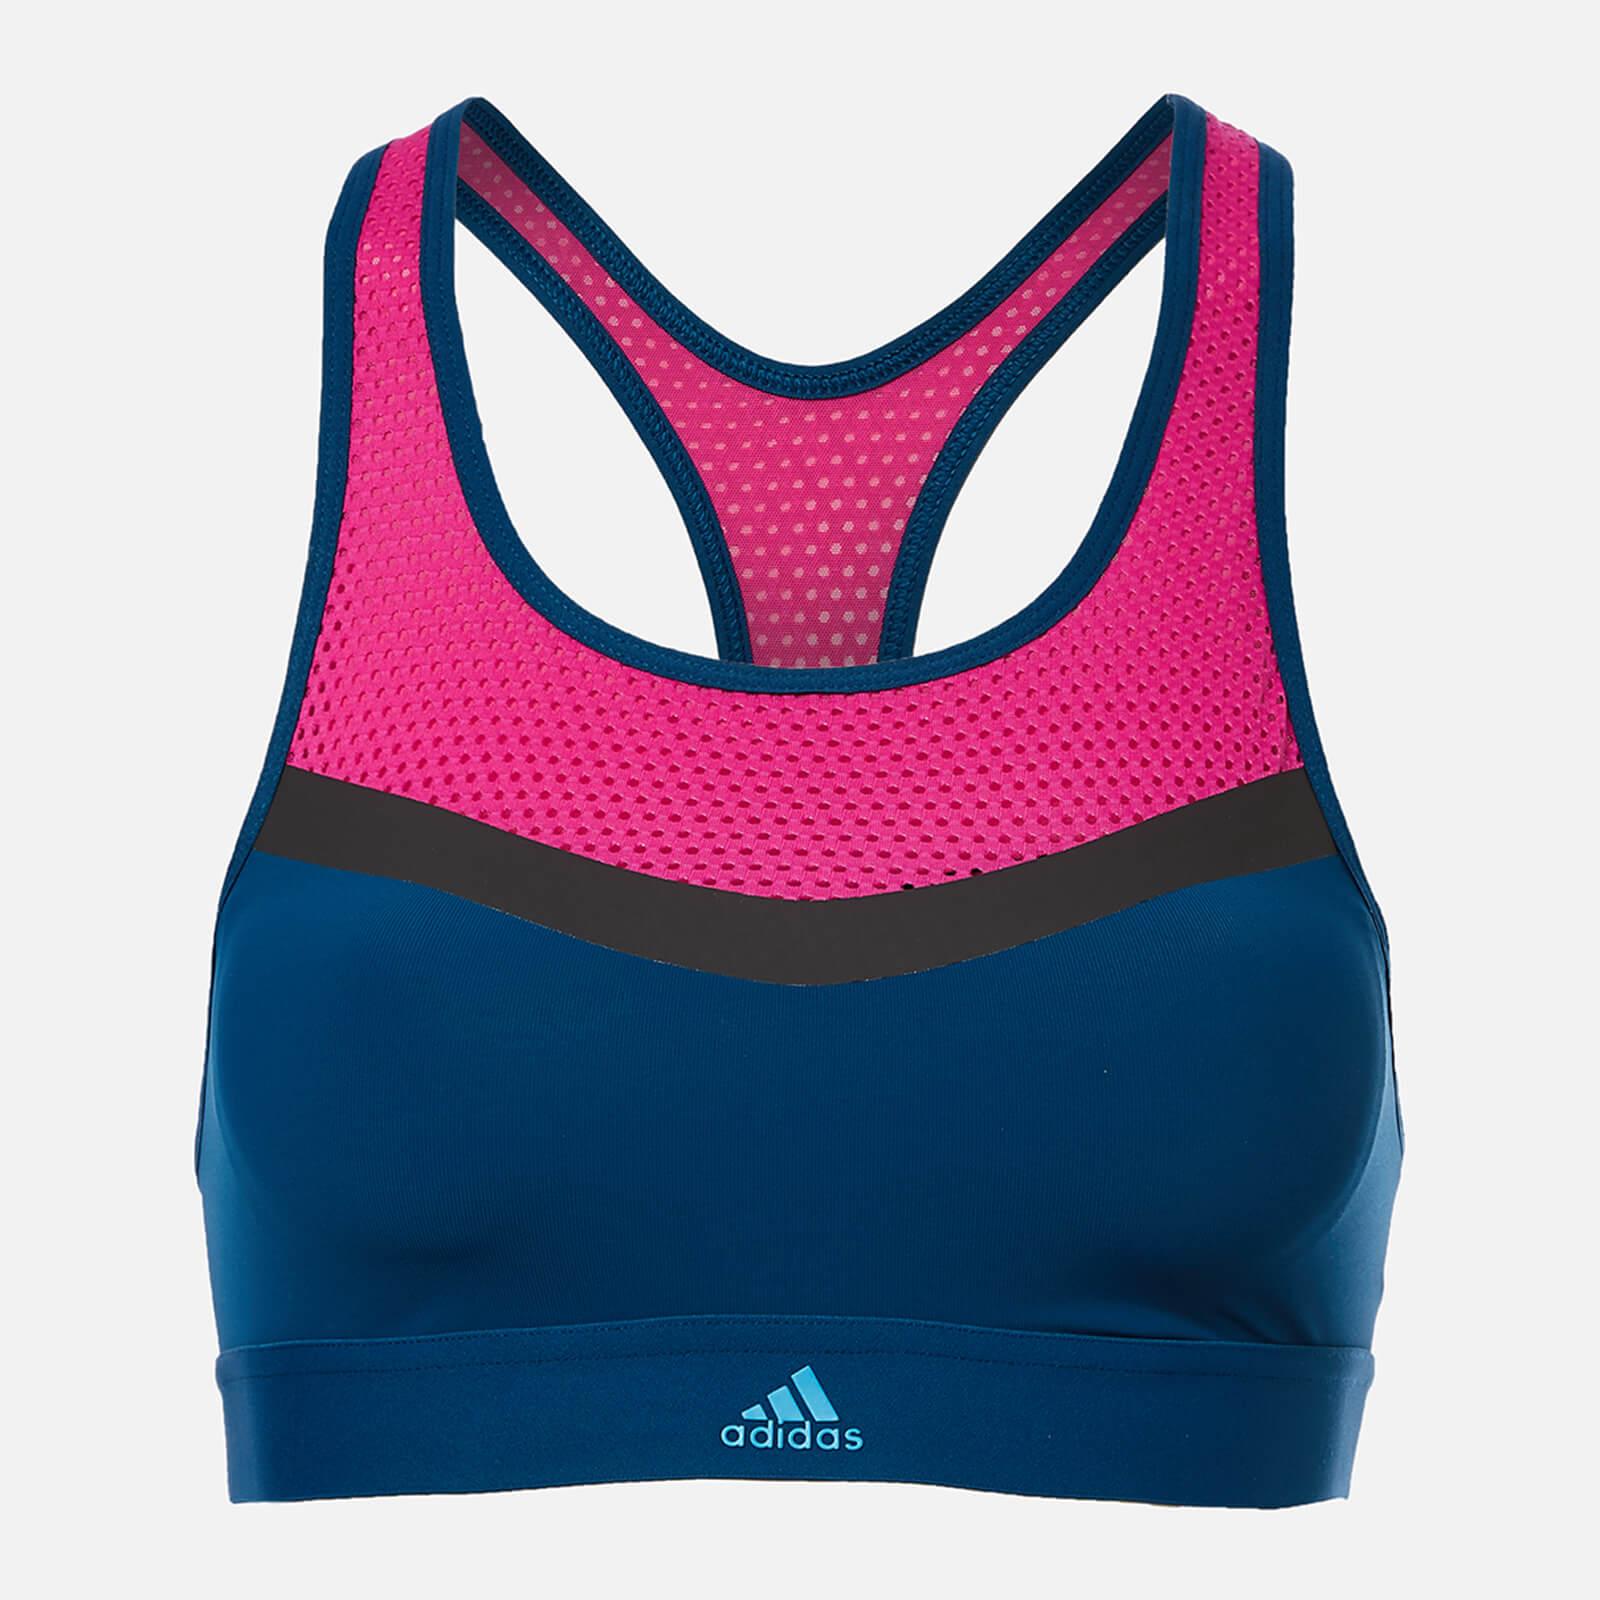 adidas Women's Don't Rest Swim Crop Top - Blue/Pink - 34D - Multi